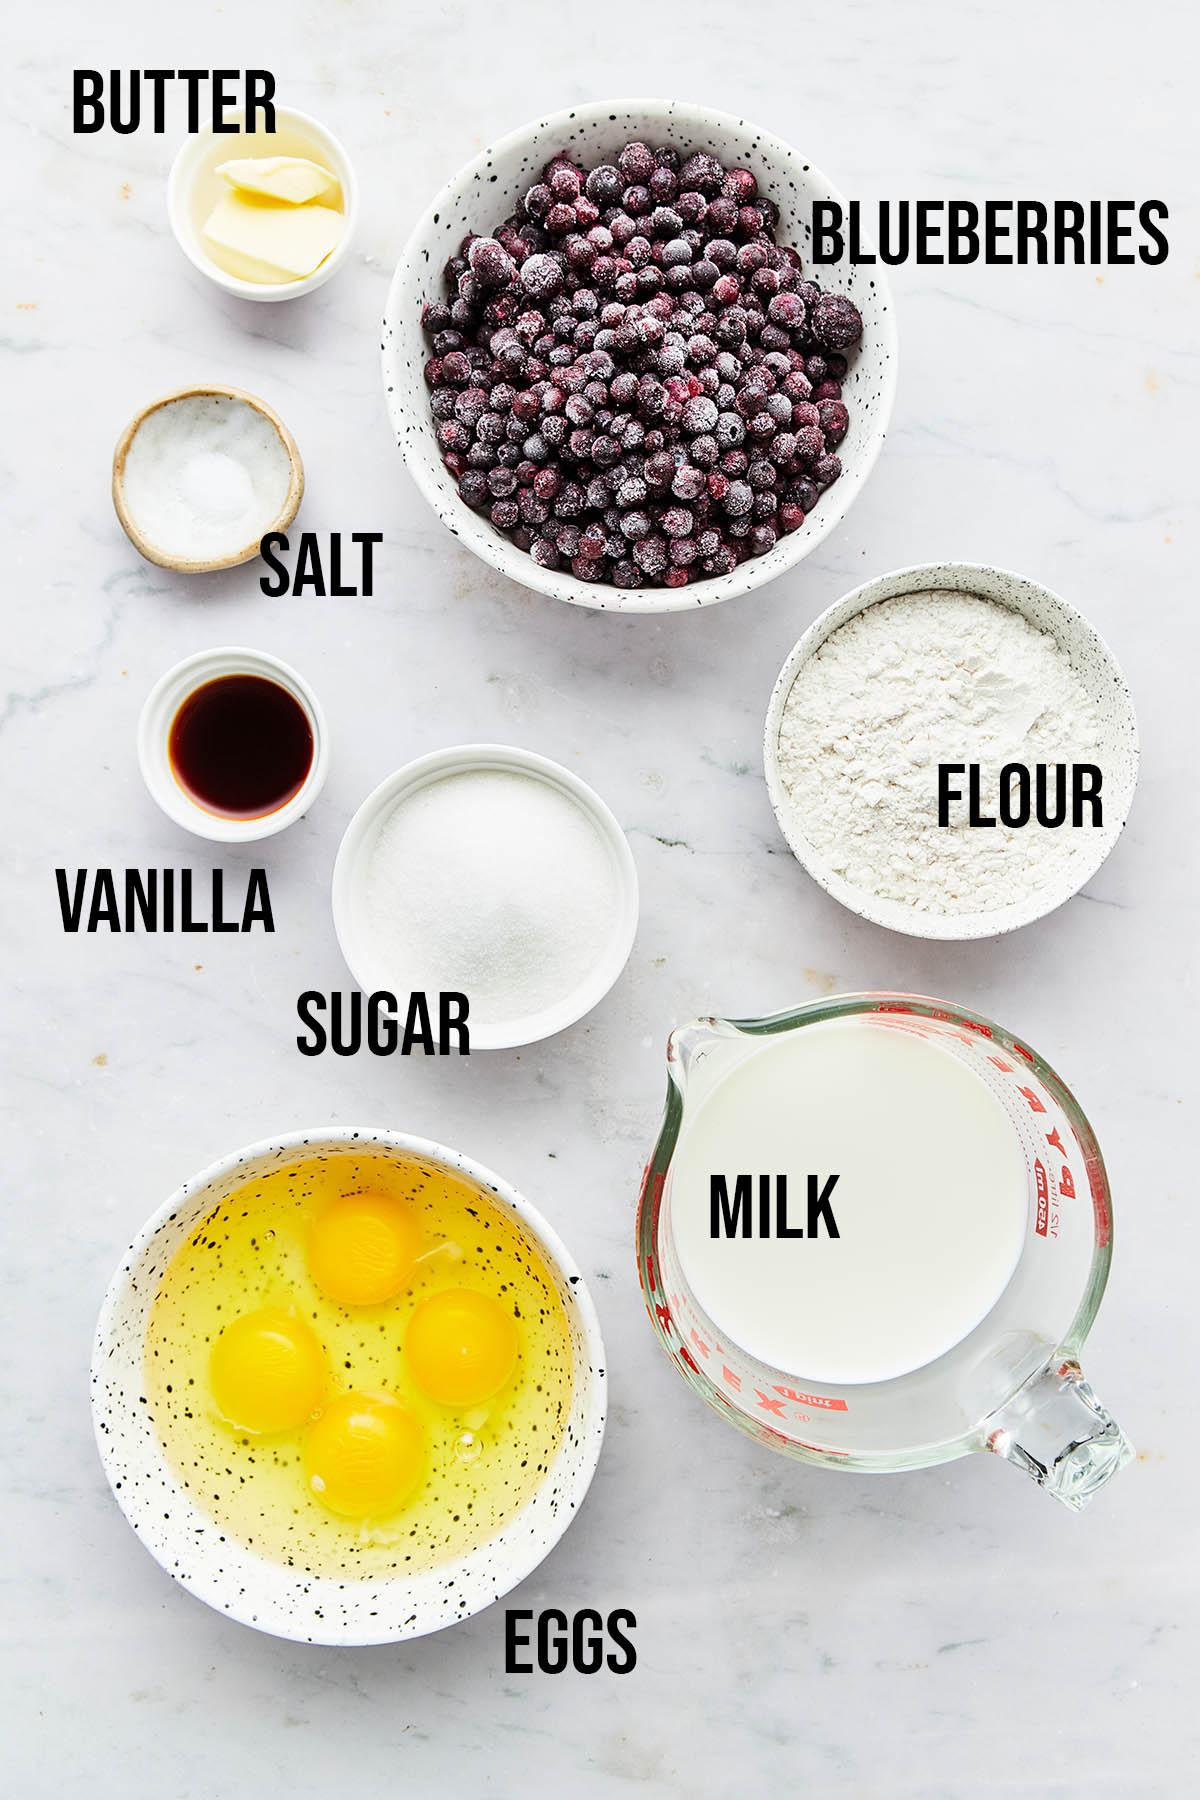 Ingredients to make blueberry clafoutis.